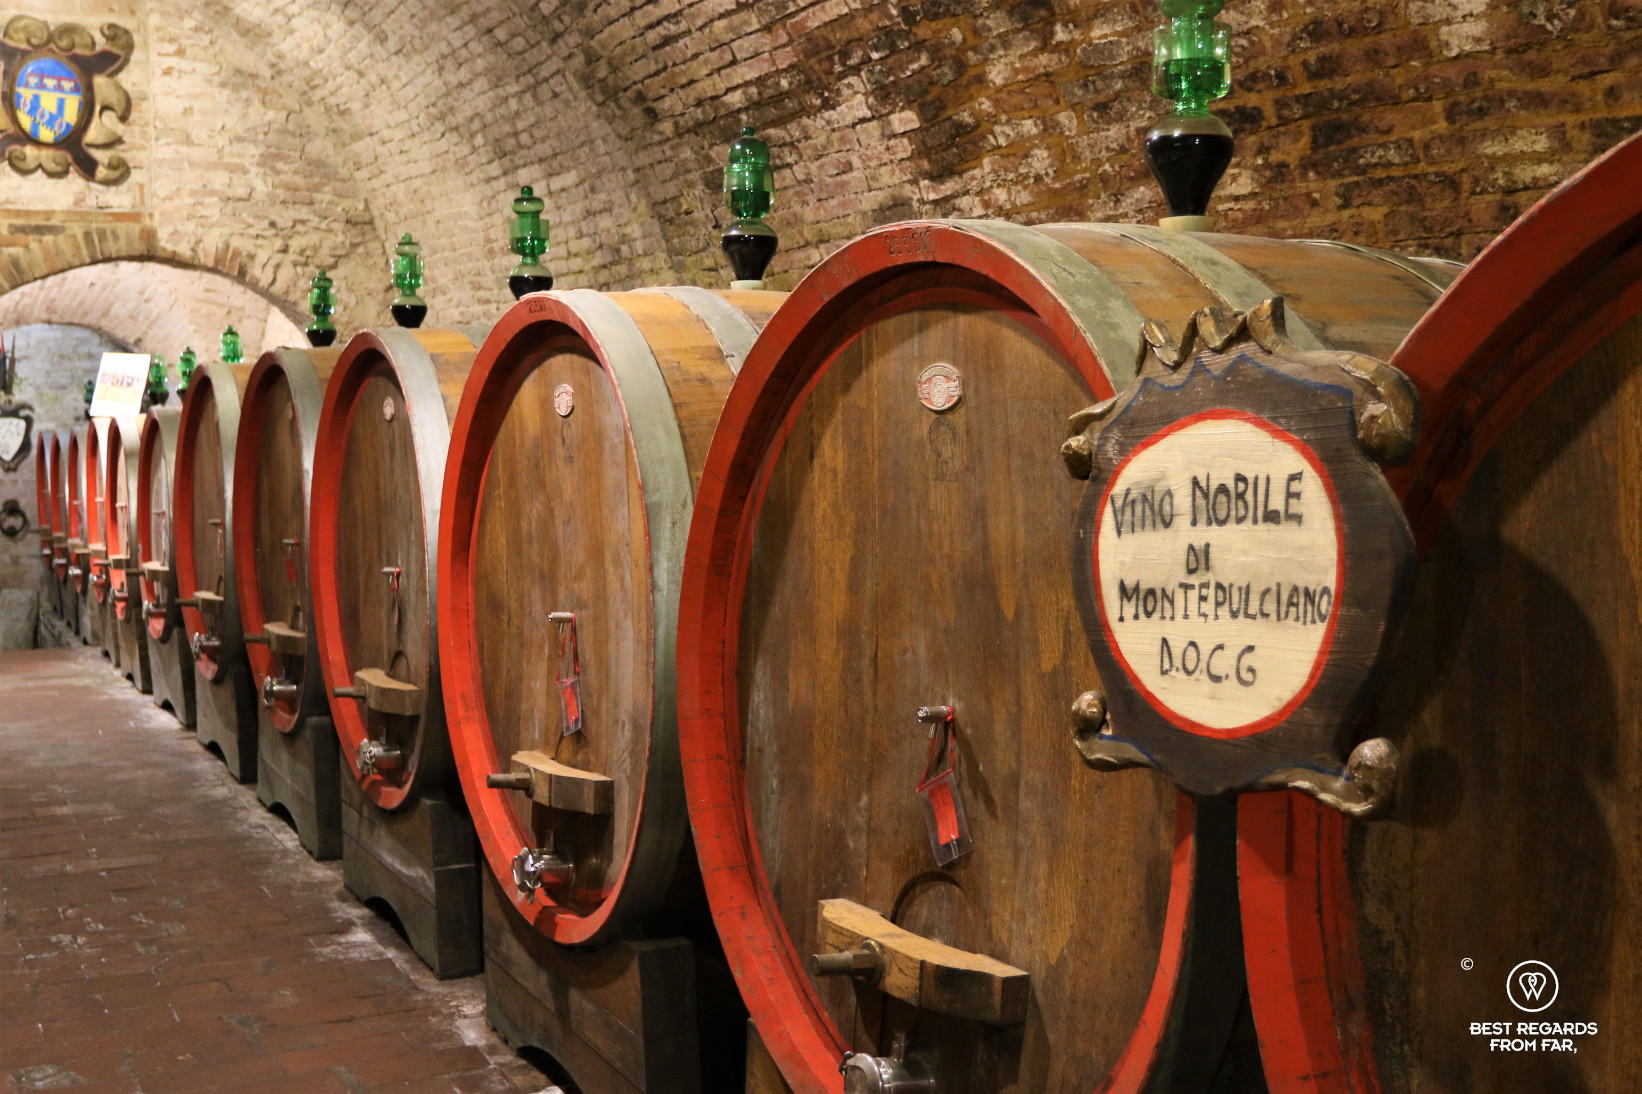 Oak wine barrels in a brick vaulted wine cellar in Italy